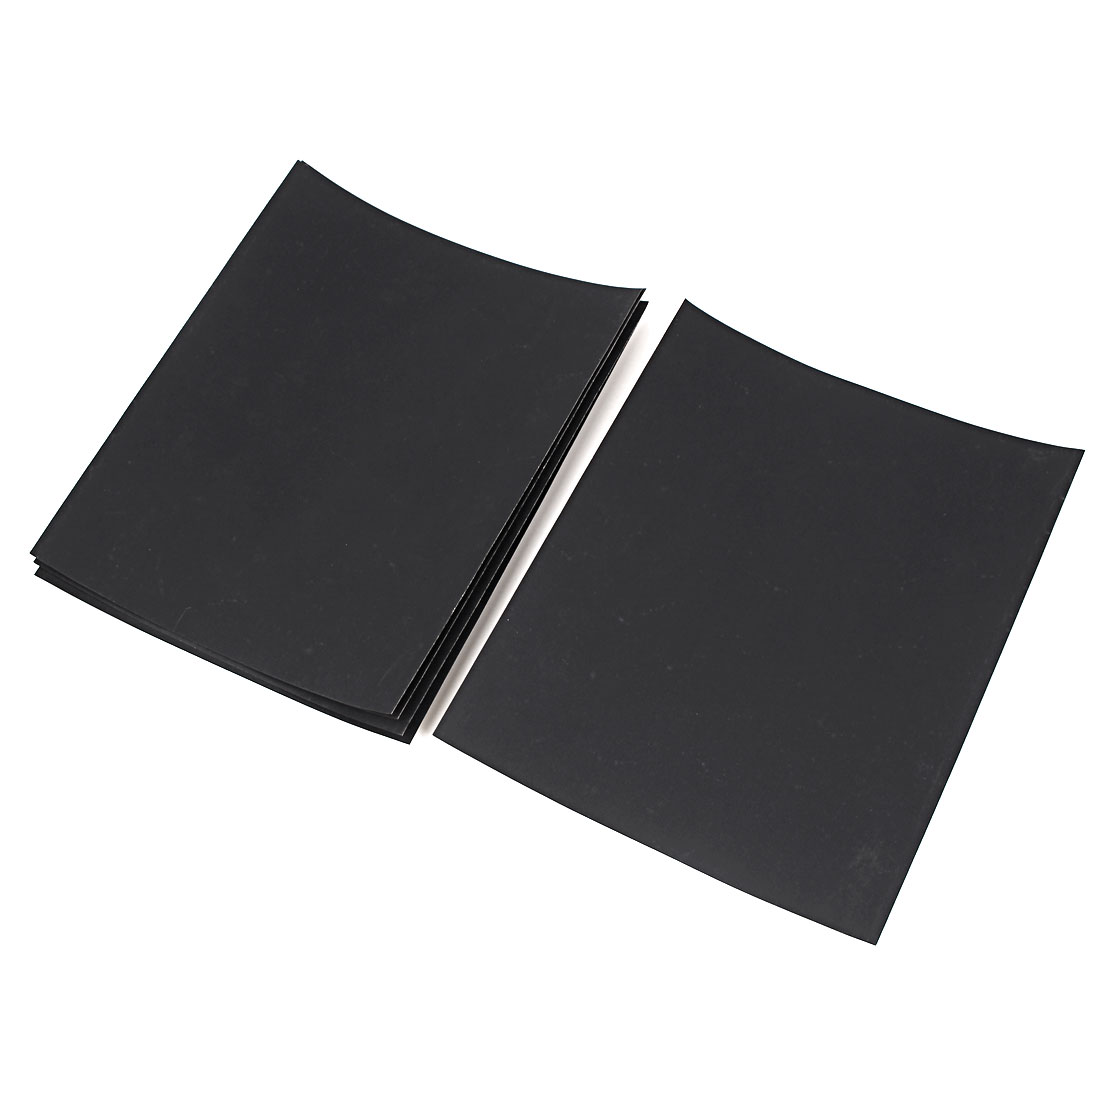 800 Grit Square Abrasive Sanding Sandpaper Sheet 230mm x 280mm 5pcs